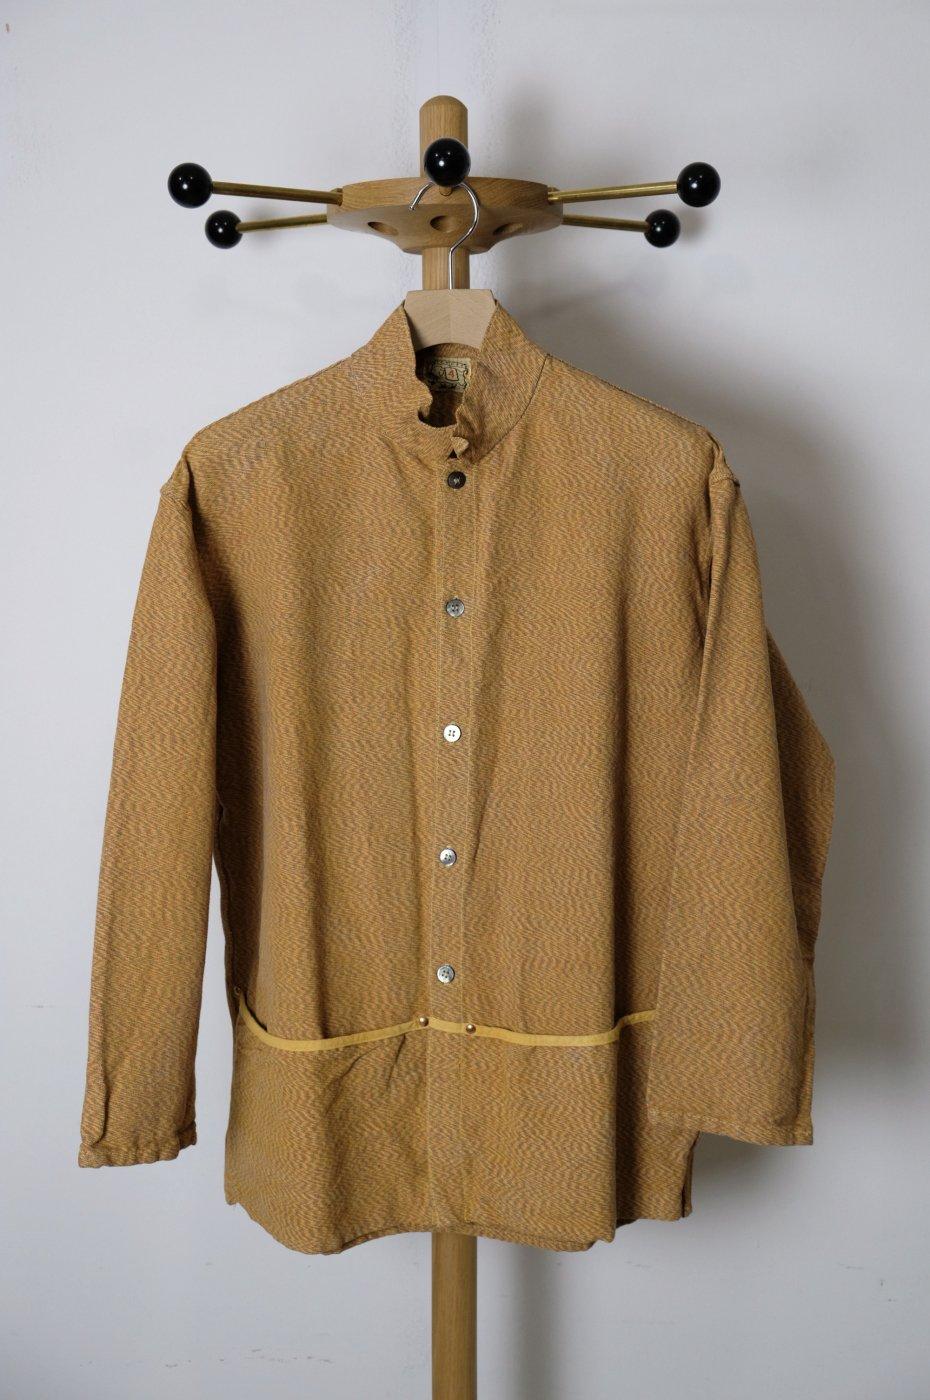 TENDER Co. 17AW-Type 440Folded Pocket Shirt-Yellow Ochre